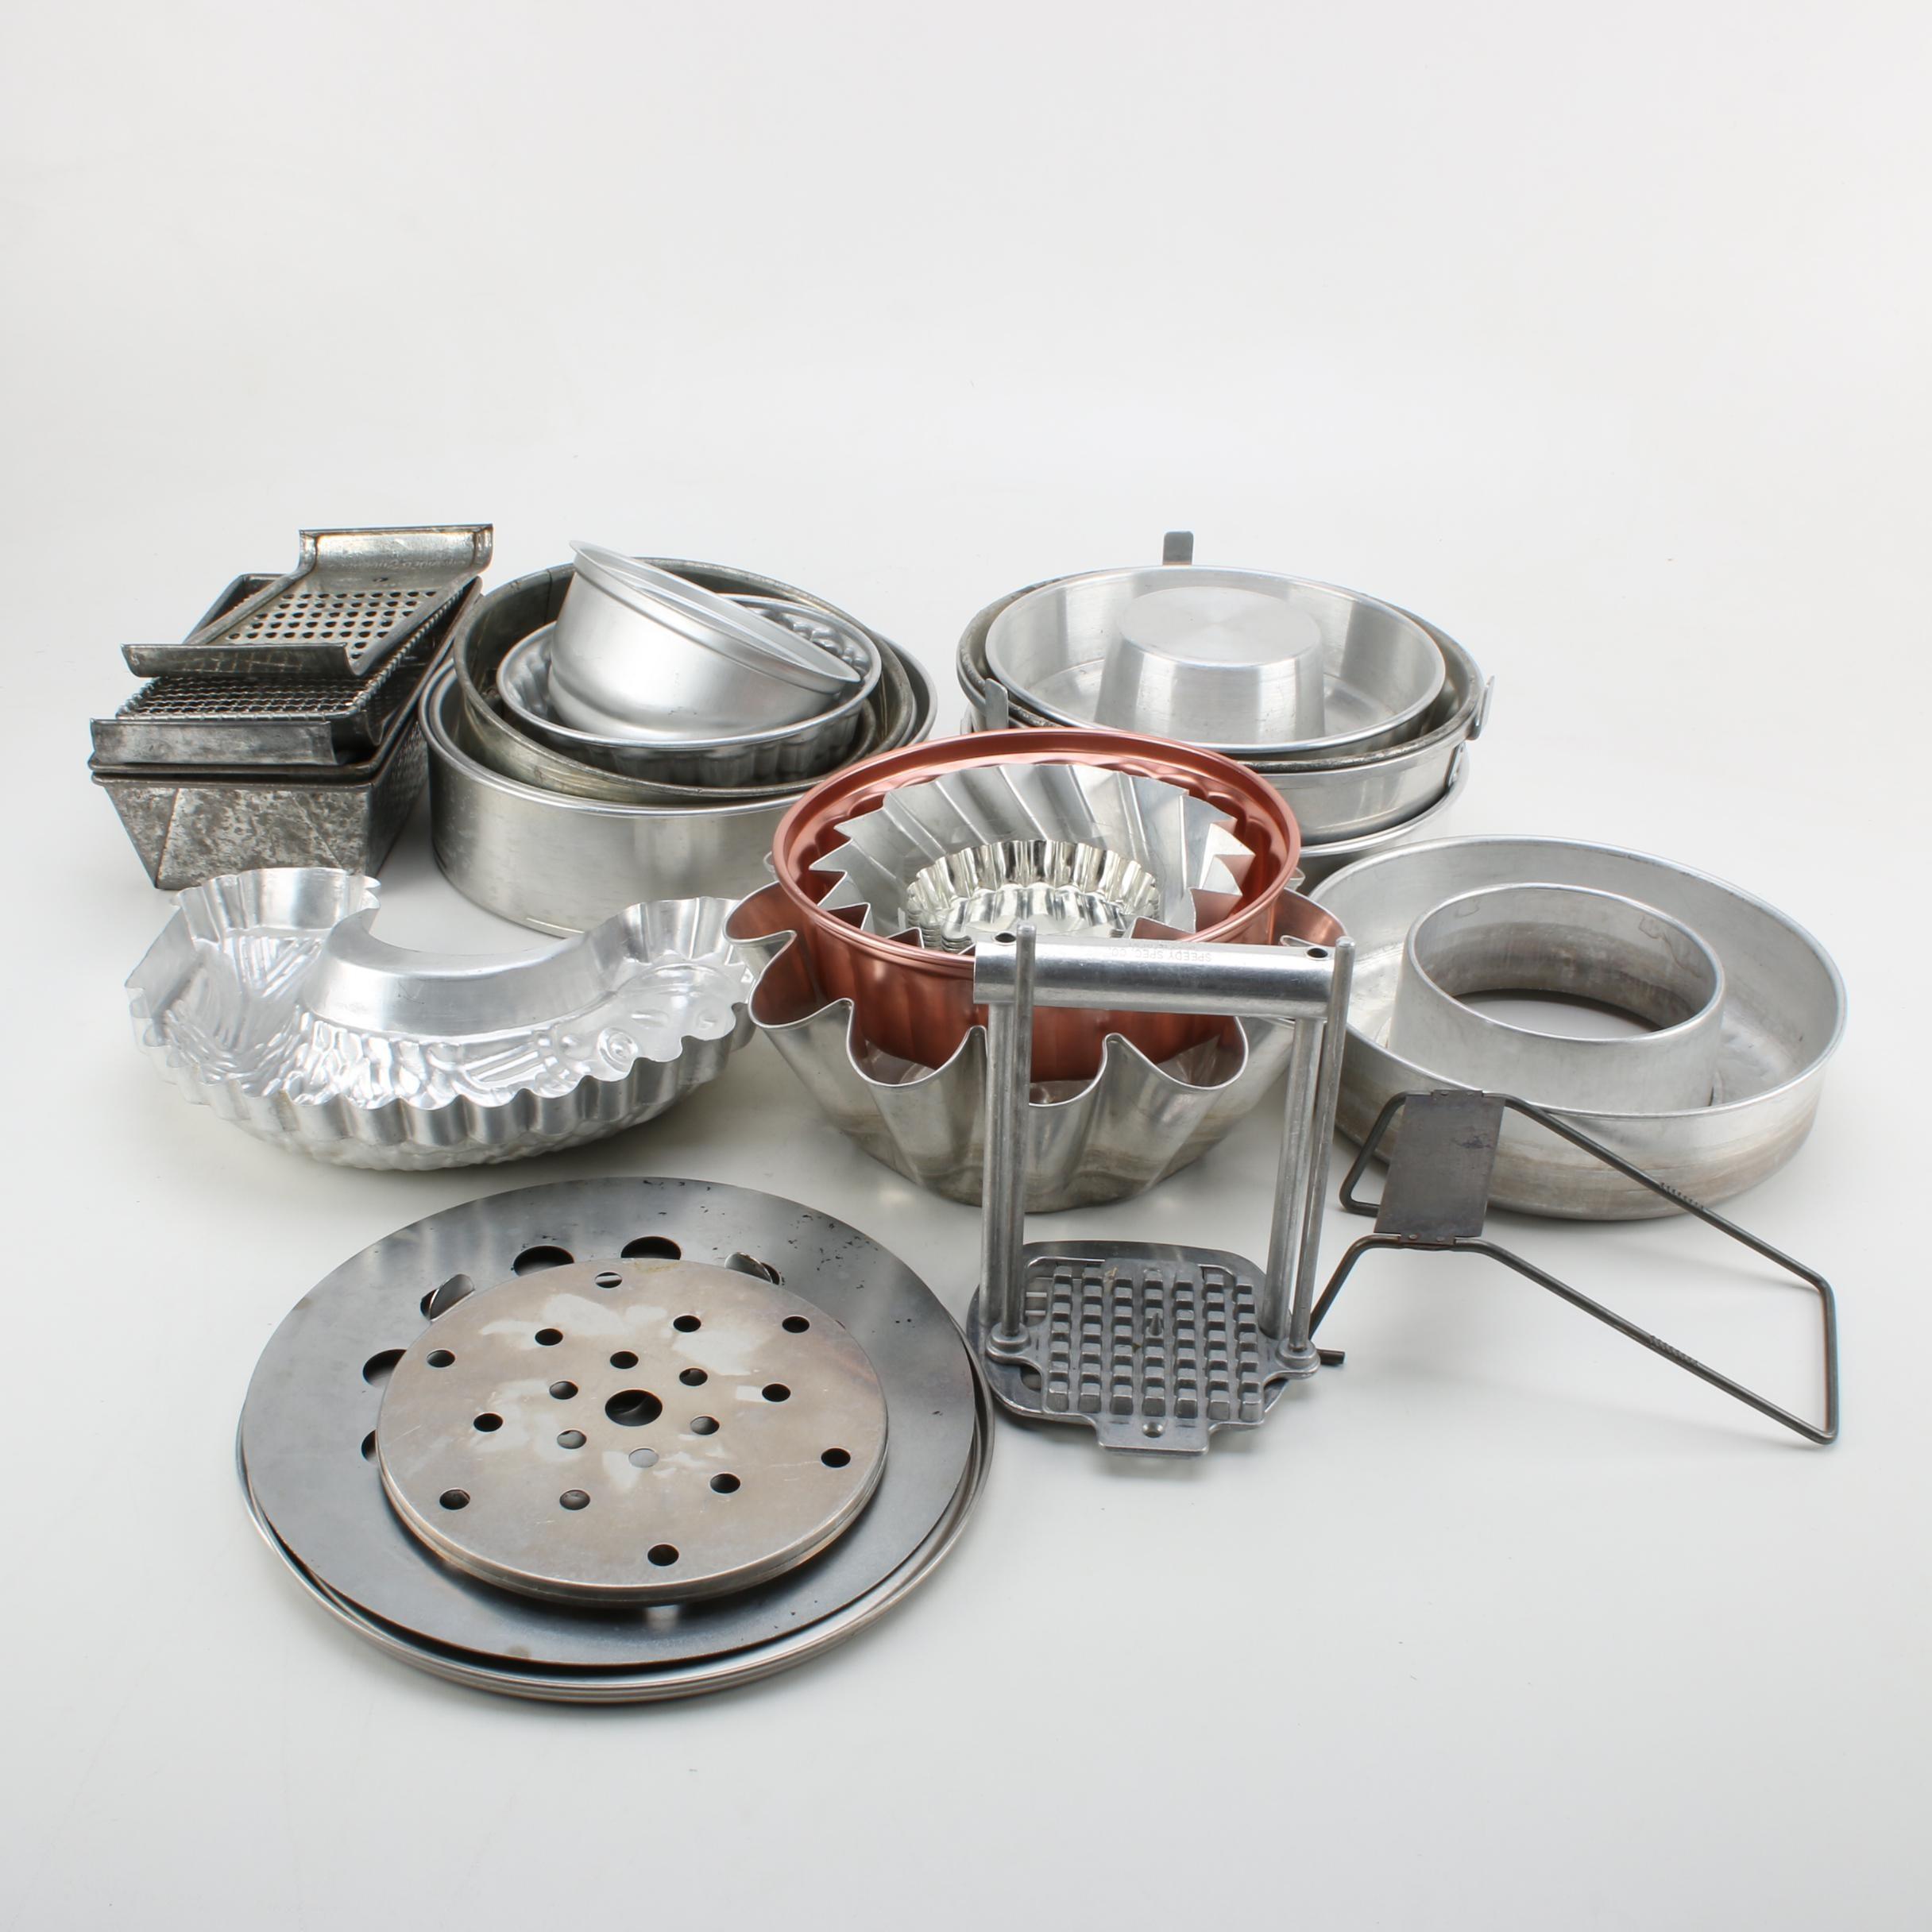 Metal Bakeware Including Molds, Bundt Pans and Cooking Utensils